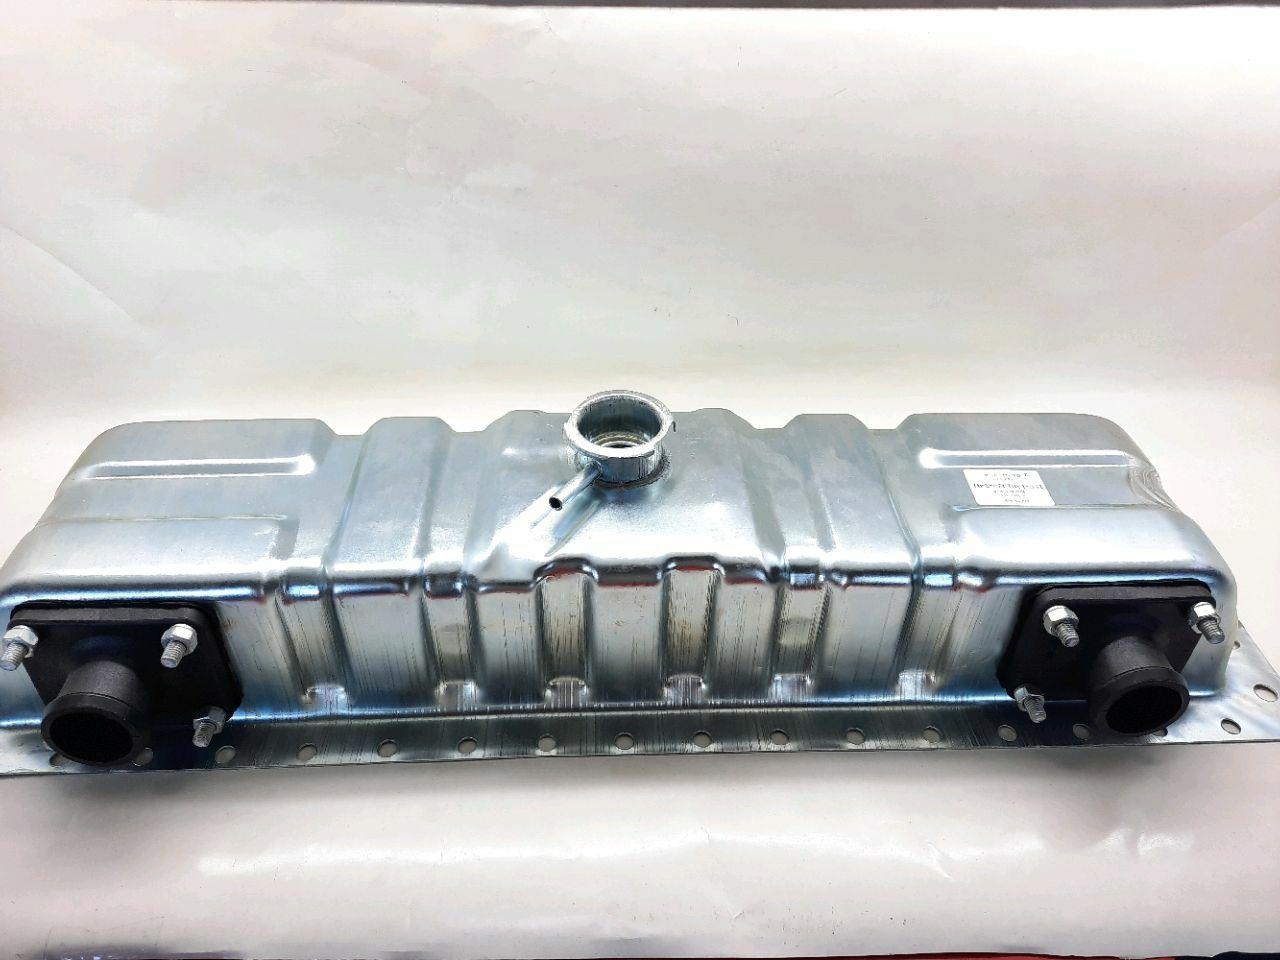 Bac de radiator T-150 (sus)